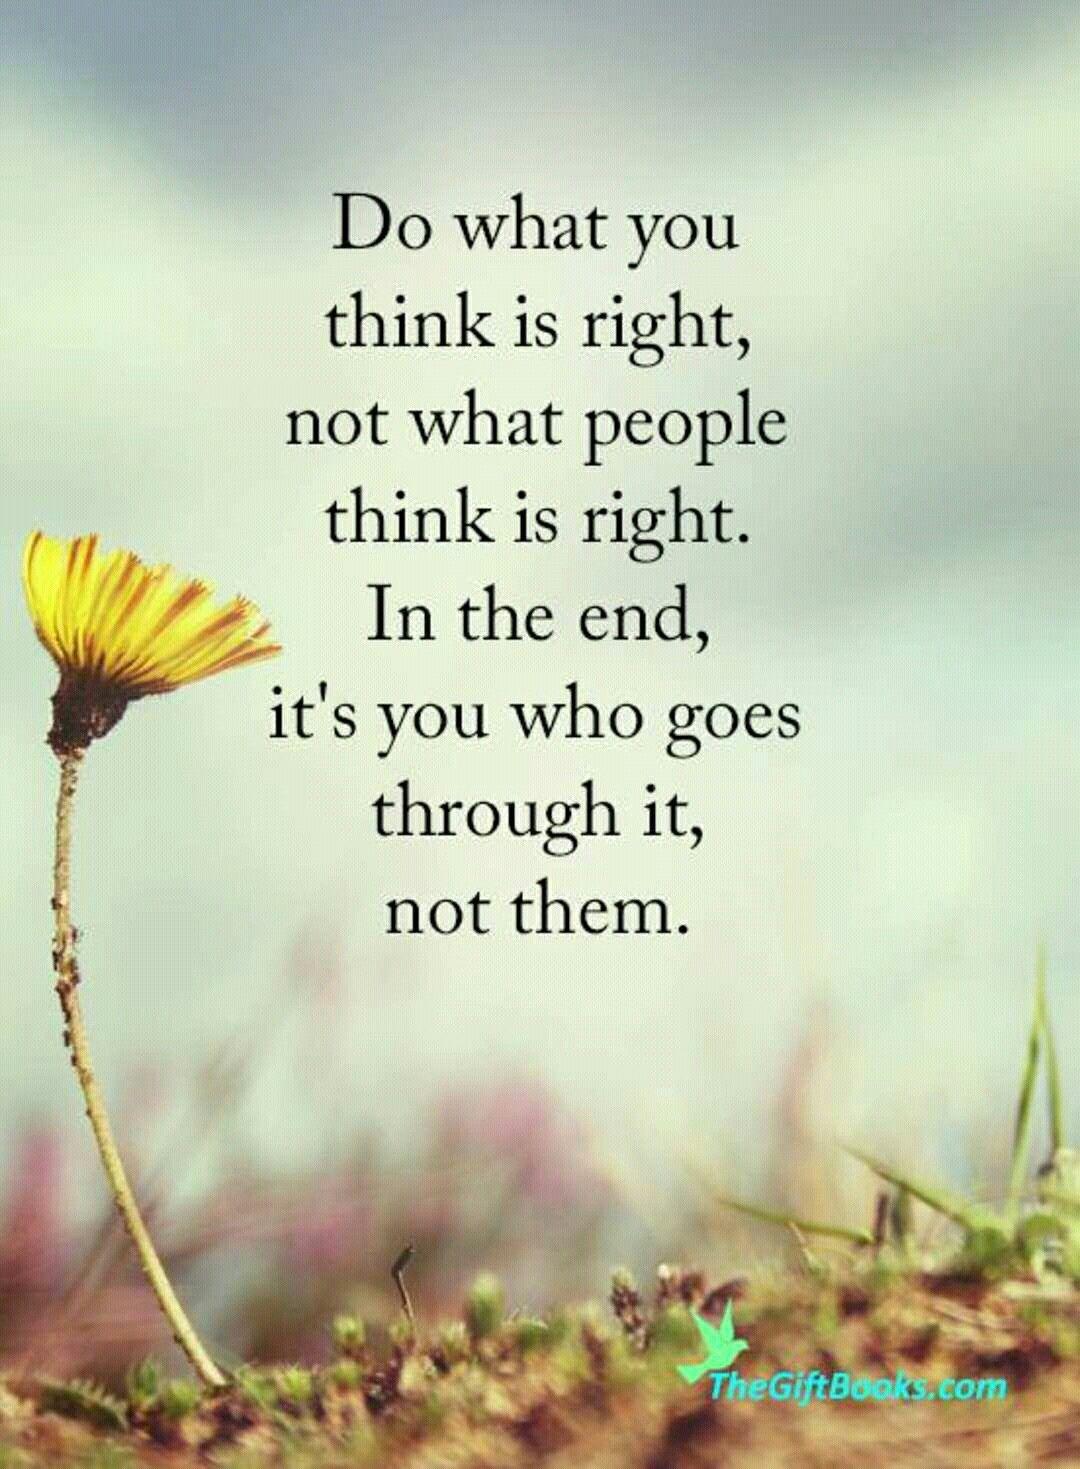 Always believe in yourself! (With images) | Believe in ...